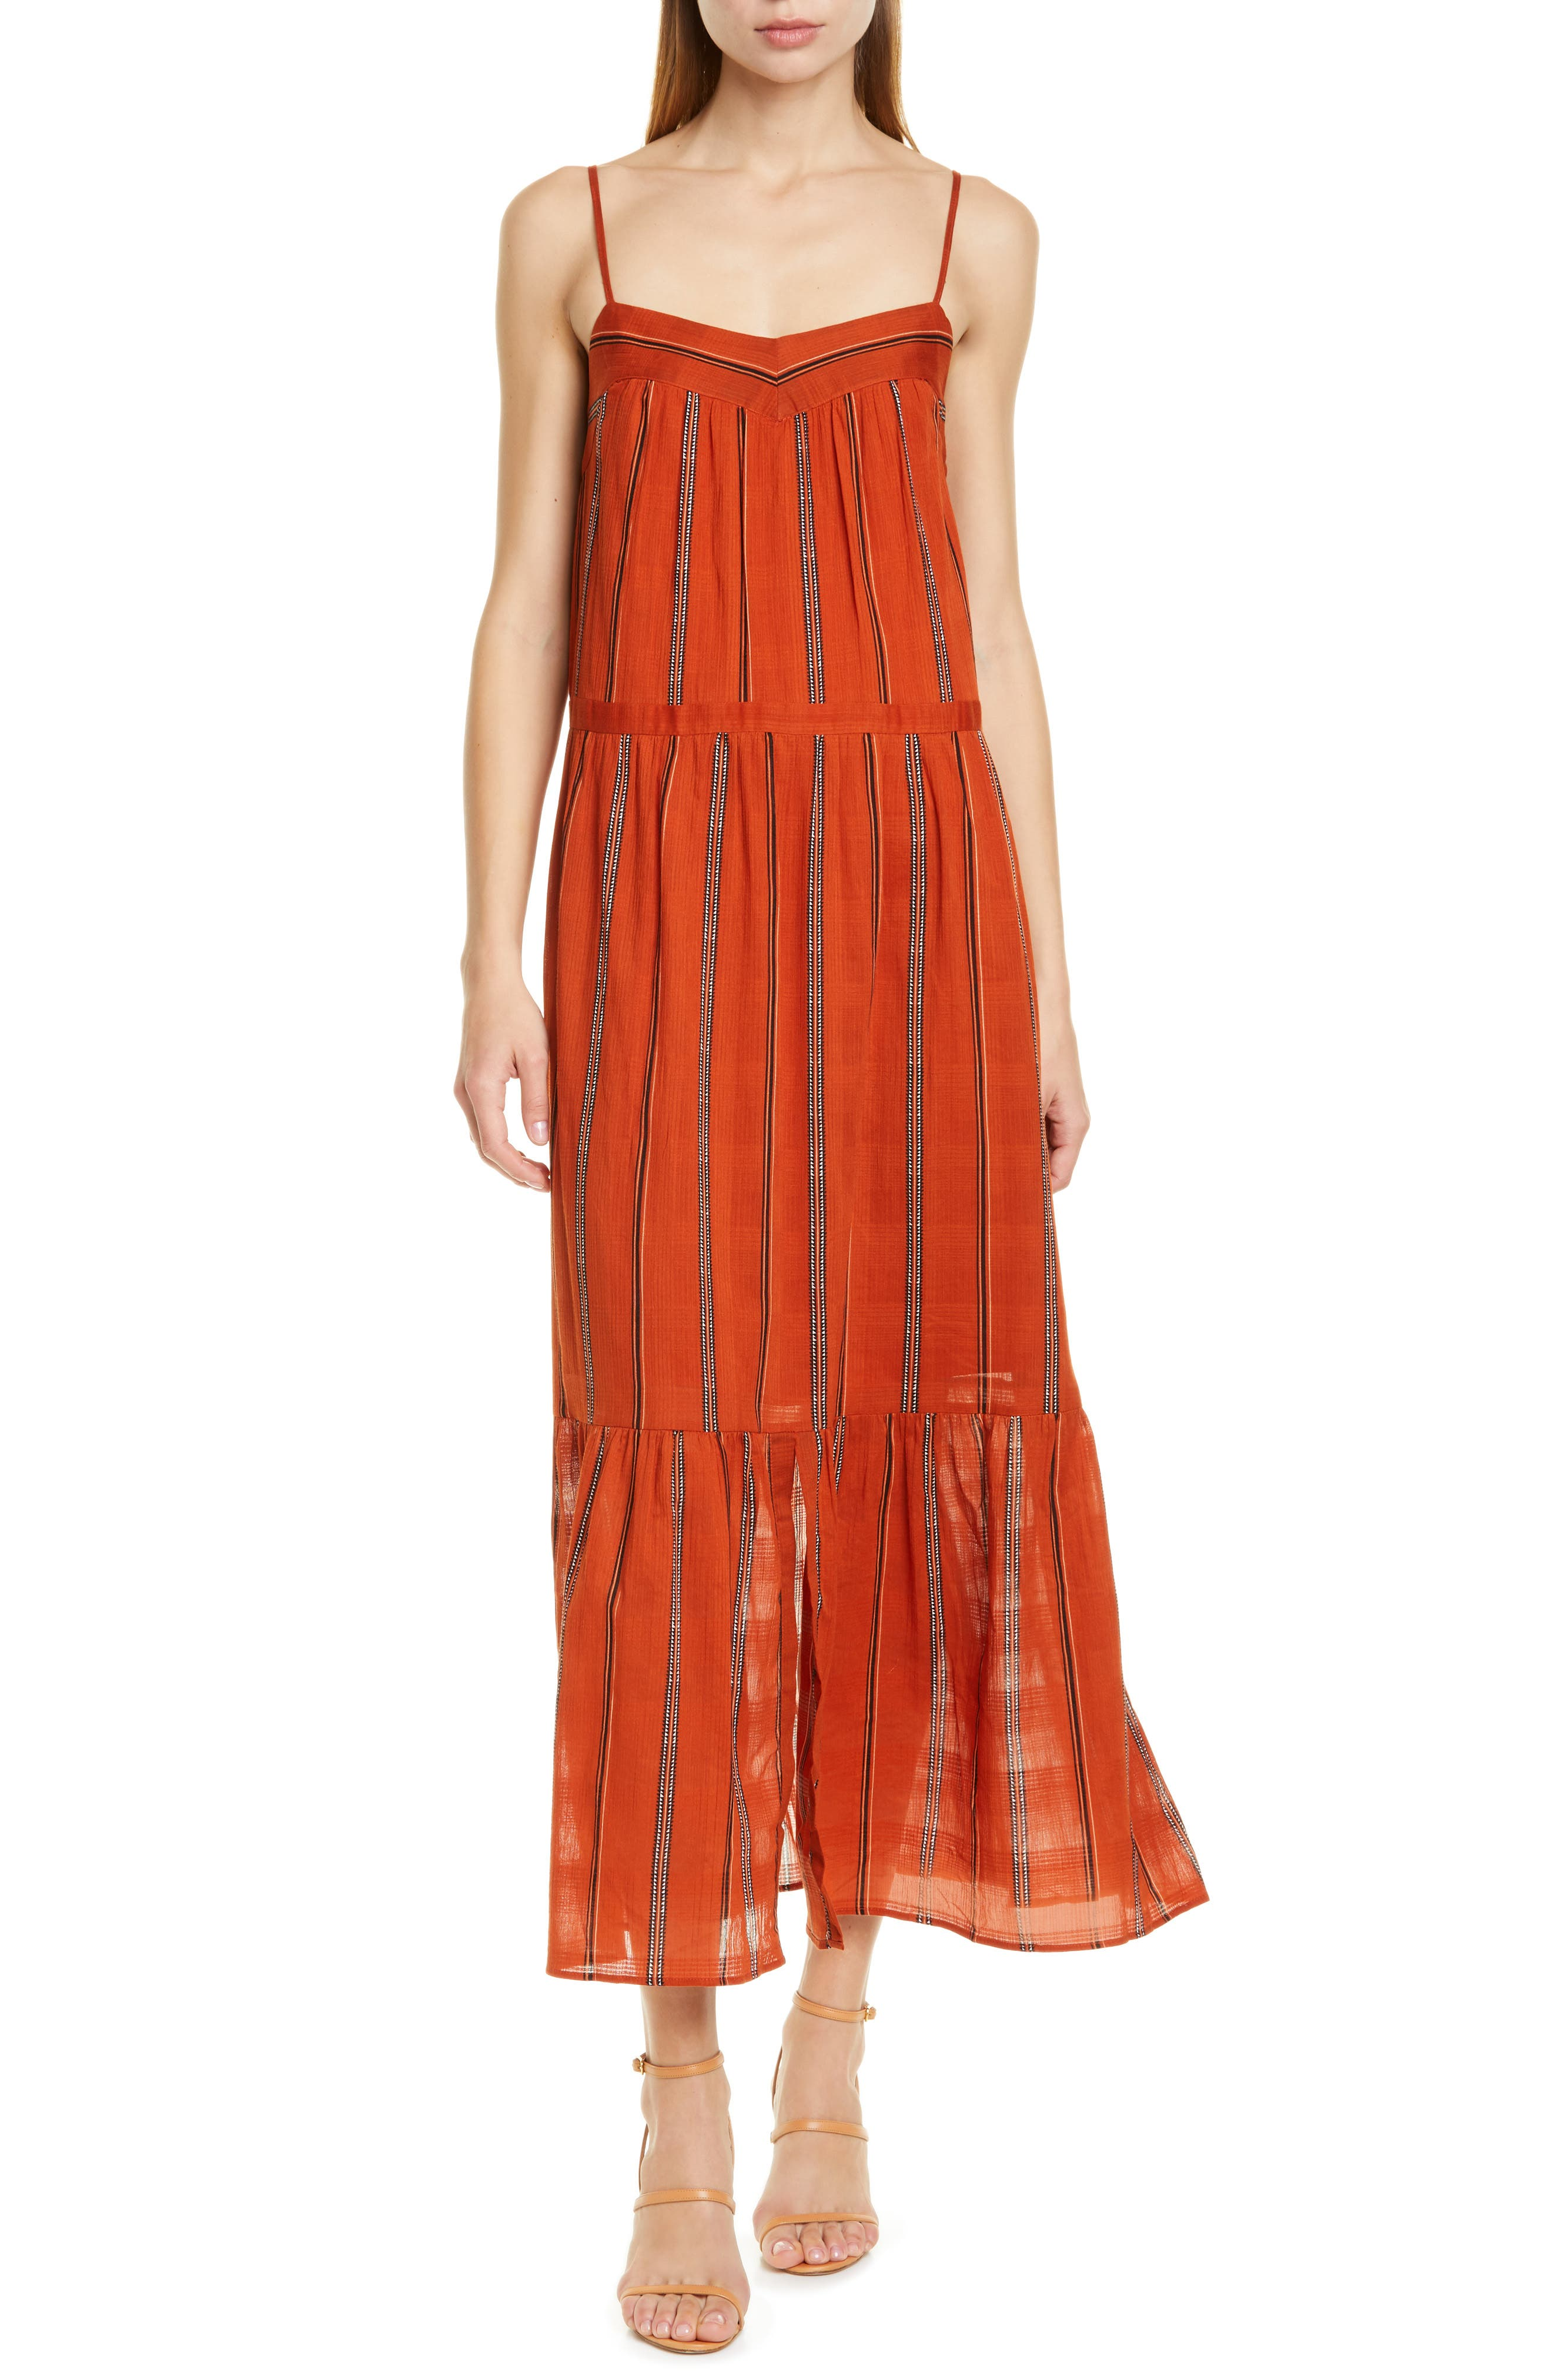 Ba & sh Kyo Tiered Cotton Maxi Dress, Brown